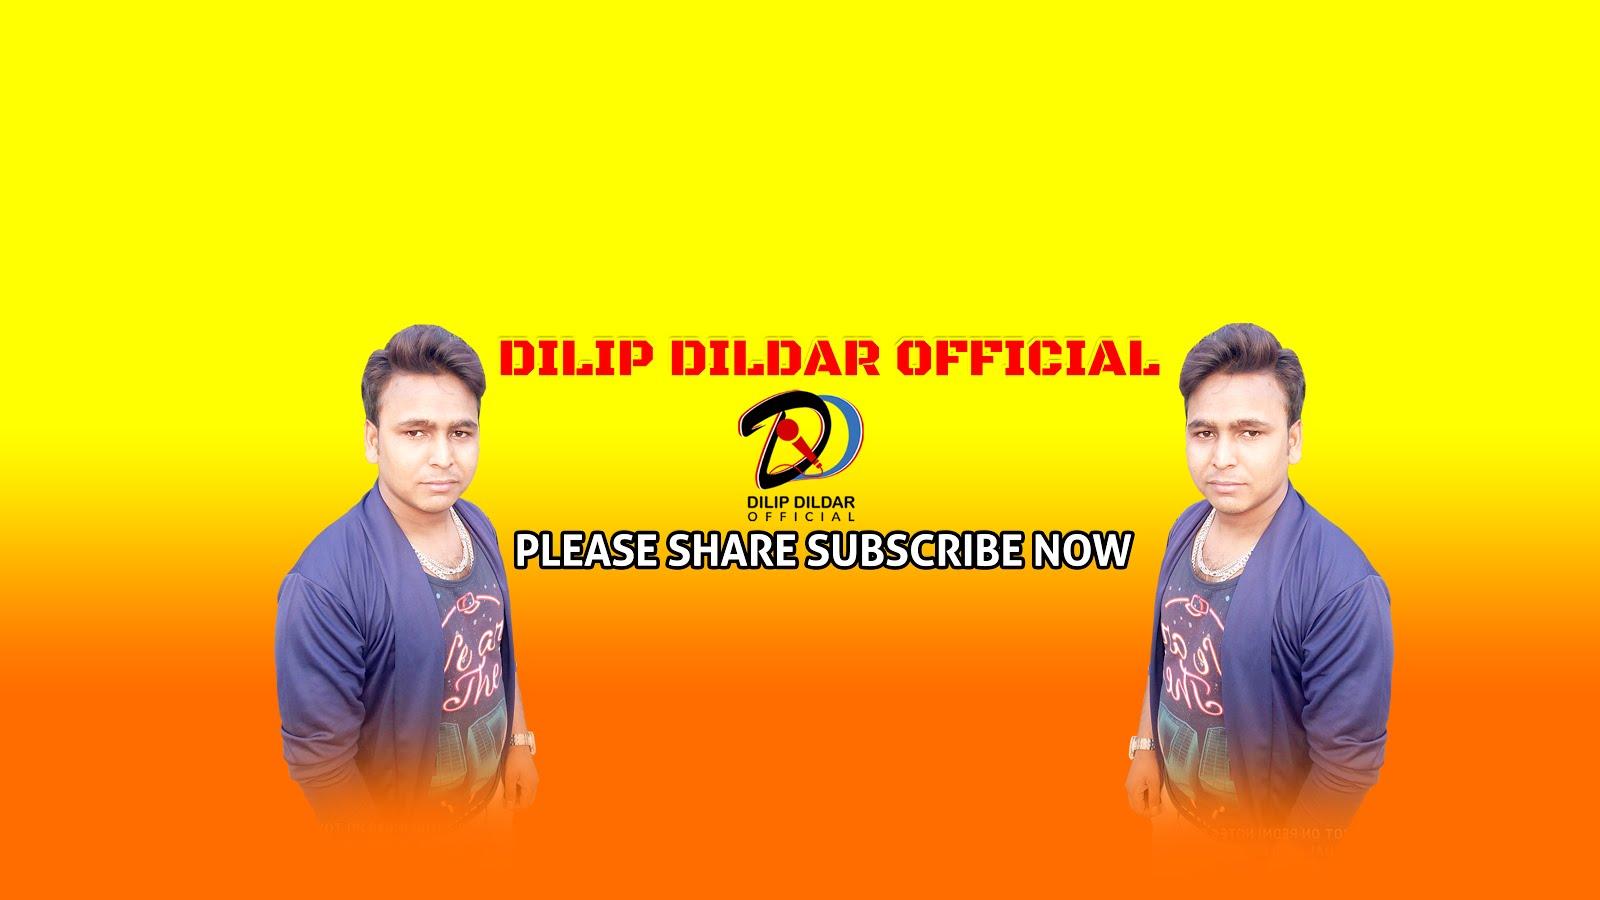 dilip dildar official youtube bakgraund hd poster design hd poster design faizabad india blogger